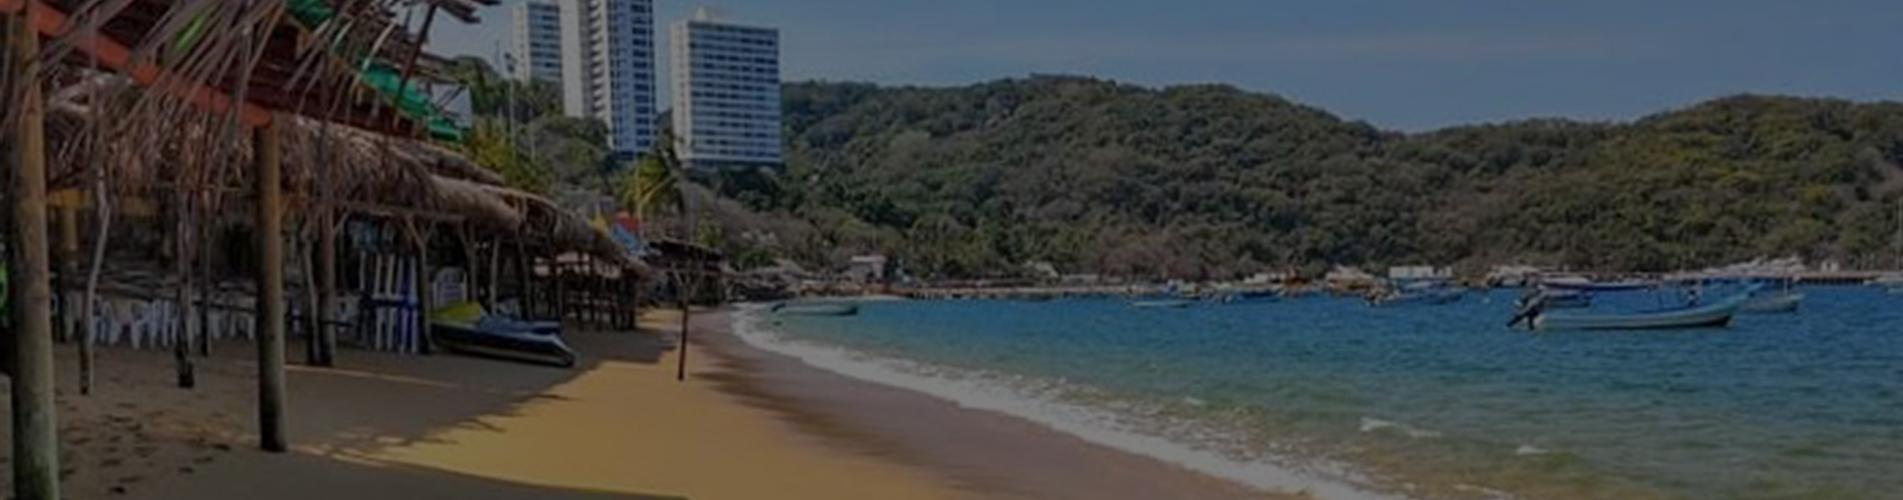 Puerto Marqués Acapulco